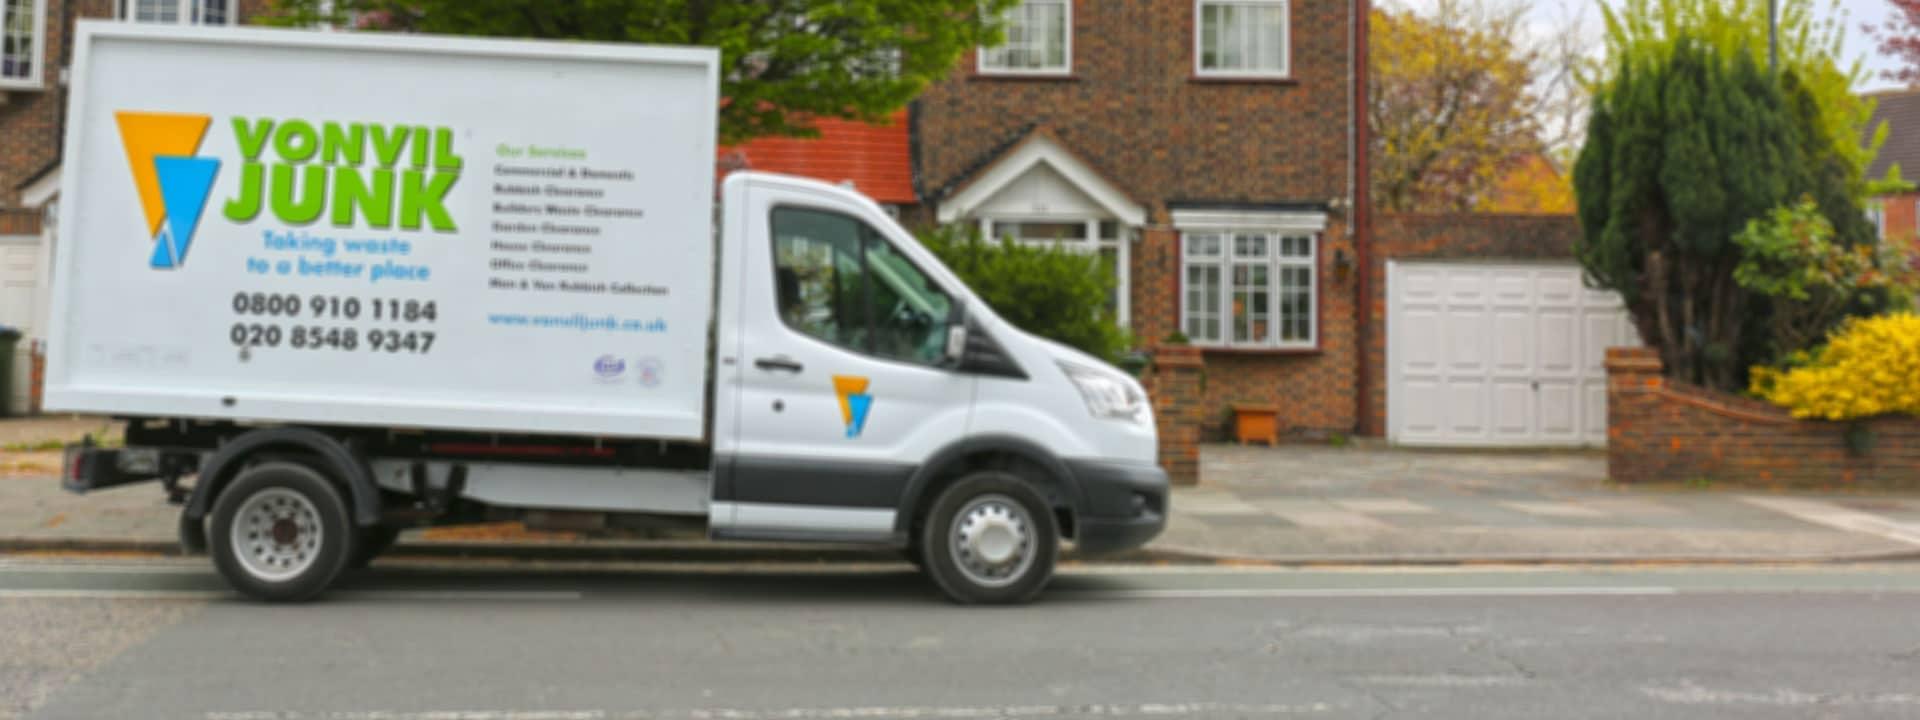 Rubbish Removal London Vonvil Junk Clearance